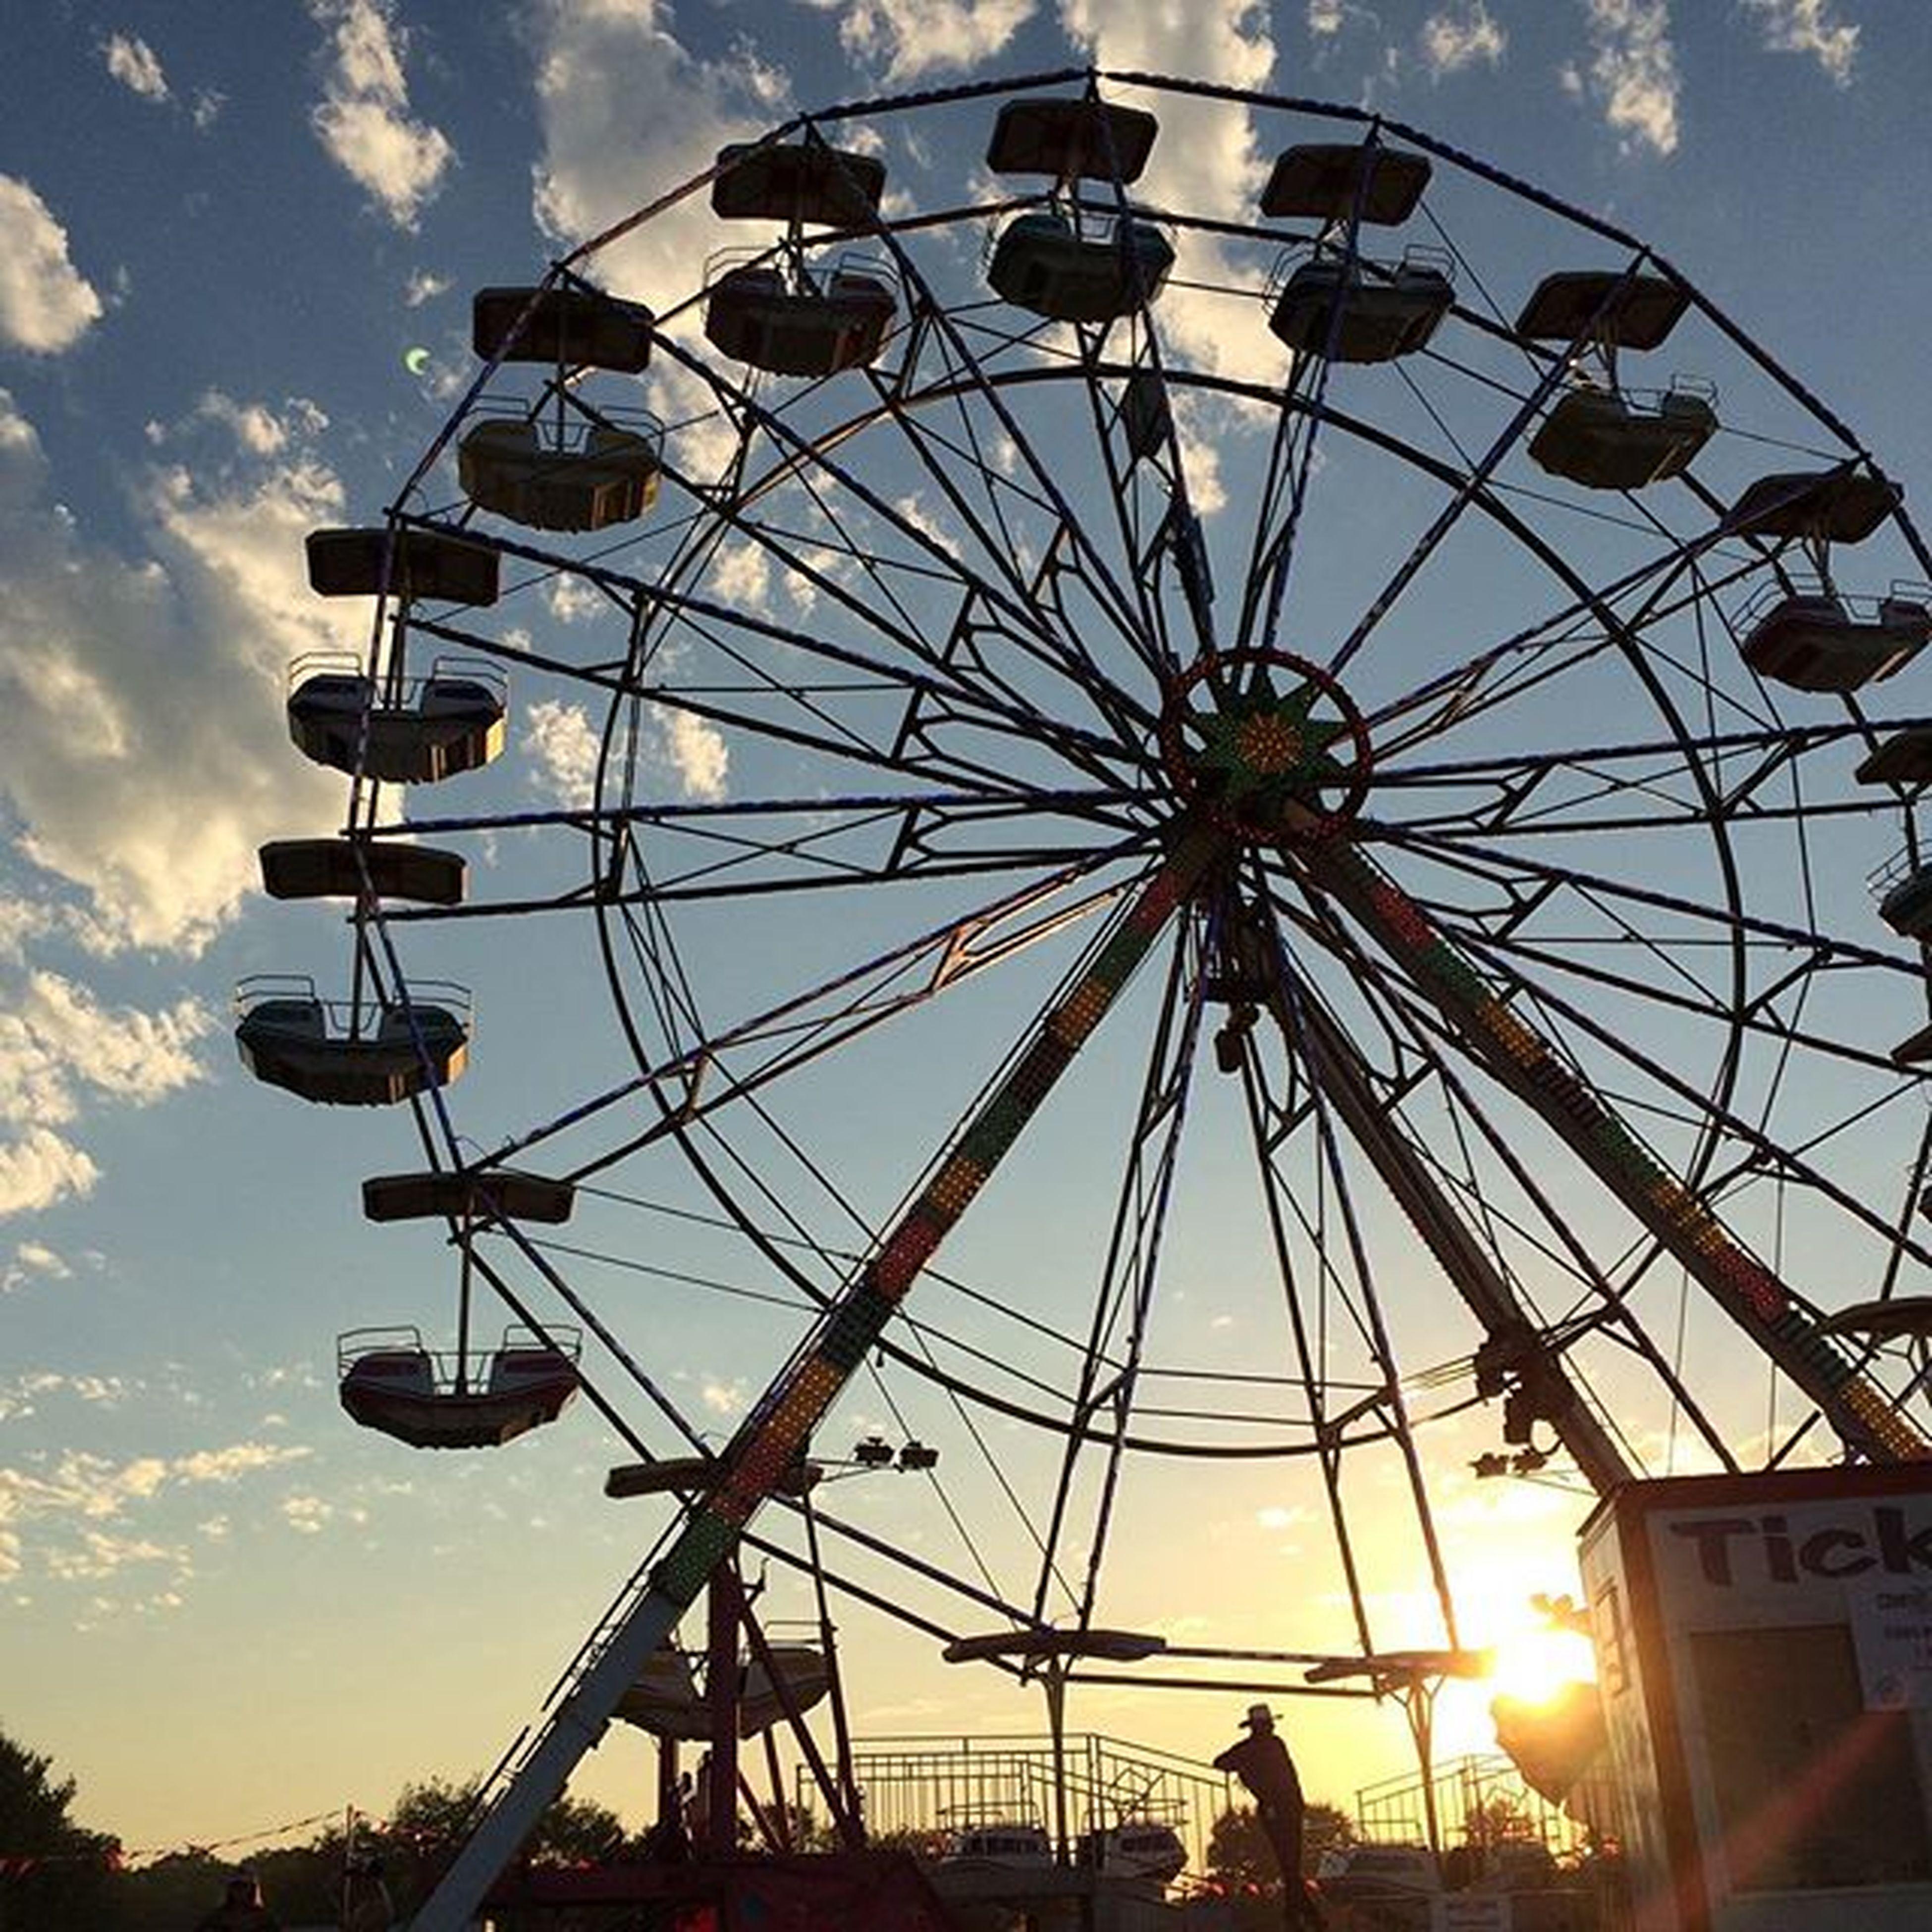 ferris wheel, amusement park, amusement park ride, low angle view, arts culture and entertainment, sky, cloud - sky, silhouette, leisure activity, enjoyment, built structure, fun, architecture, incidental people, cloud, outdoors, sunset, large, sunlight